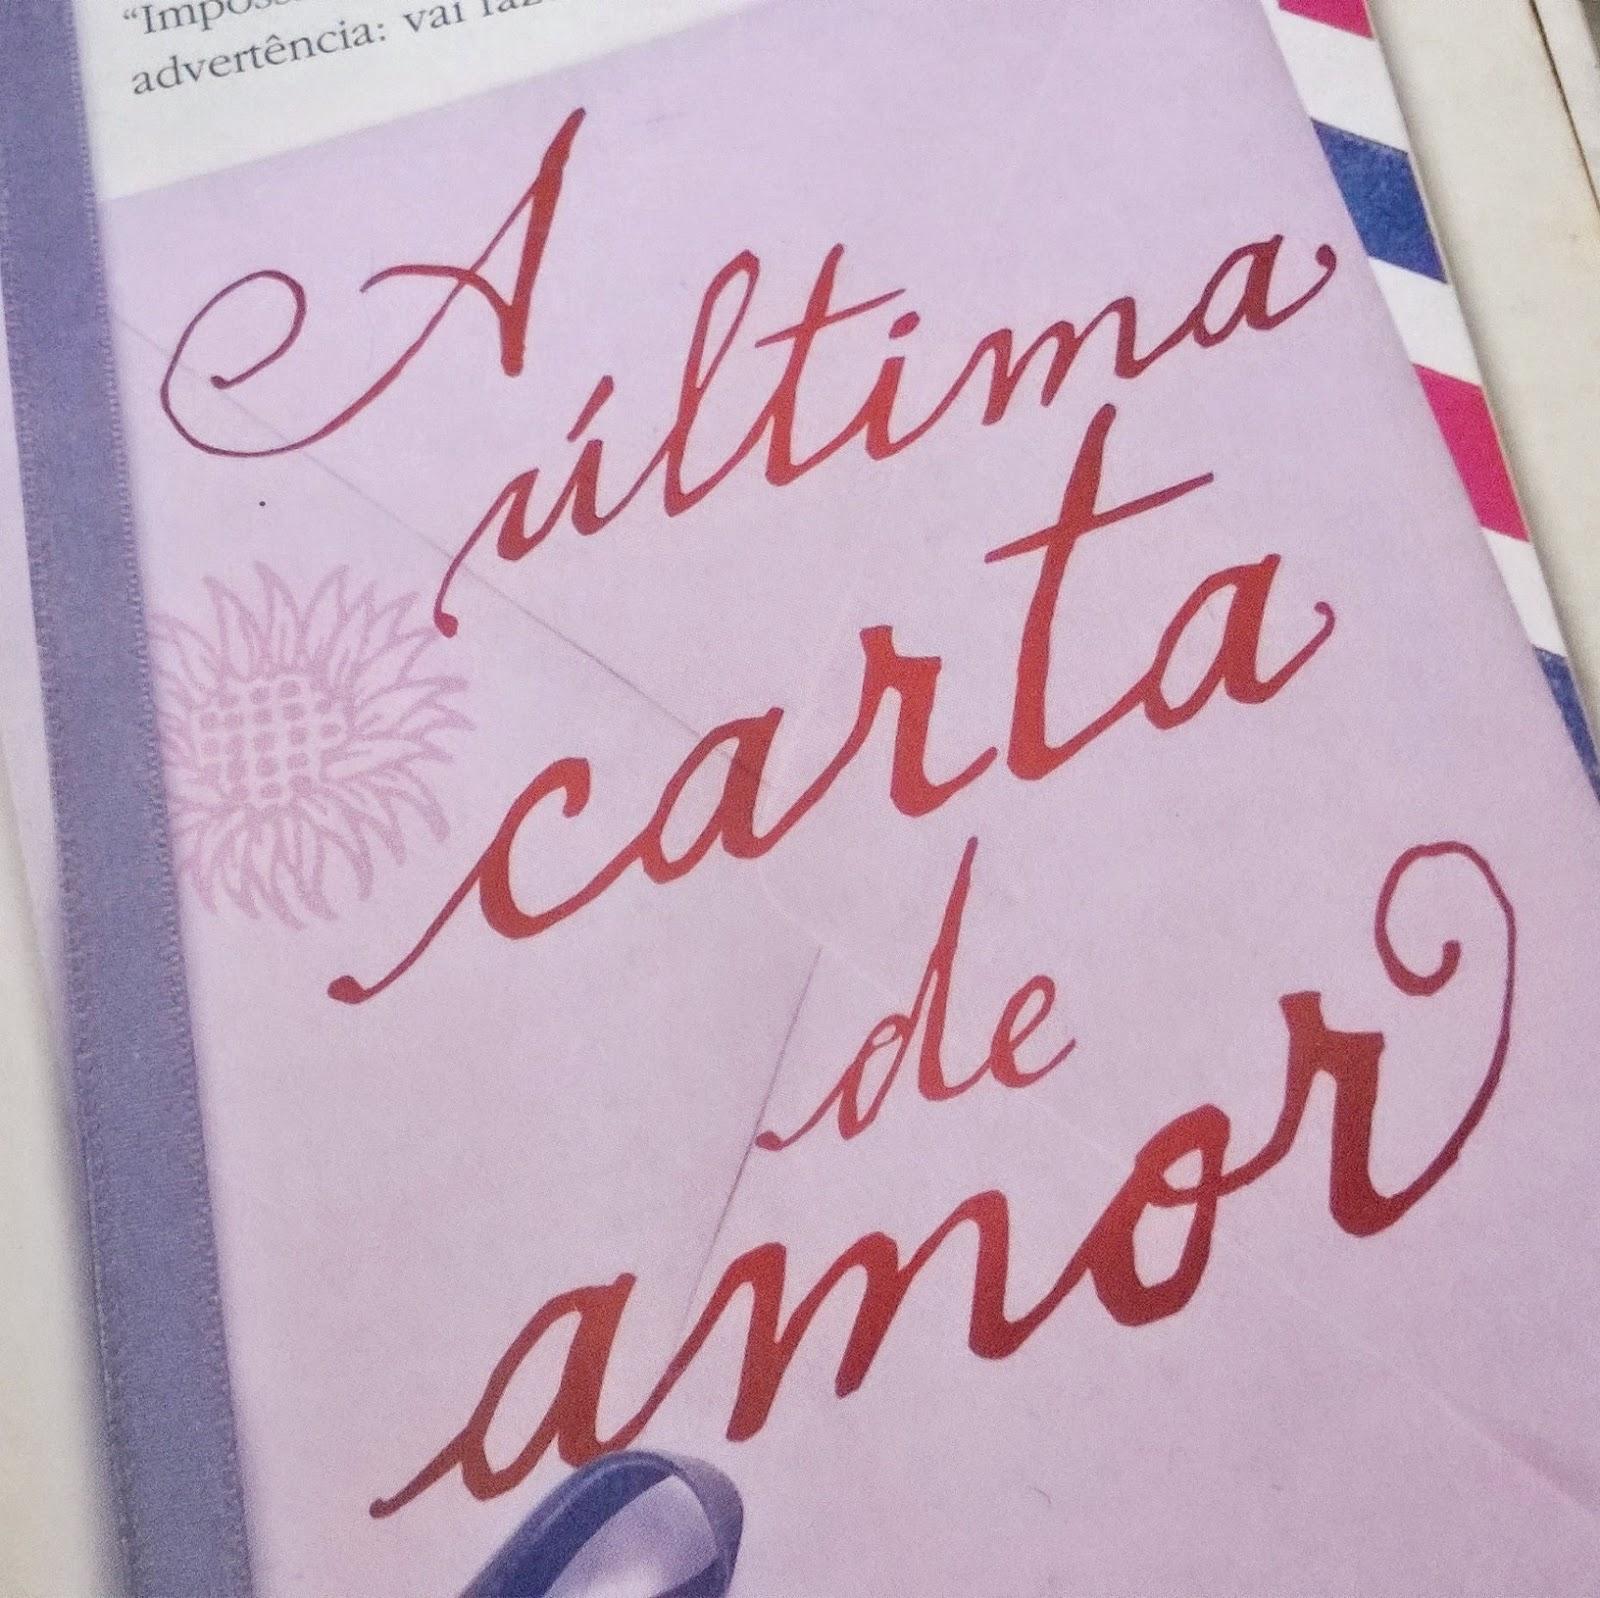 Photobook Project A última Carta De Amor Jojo Moyes Postando